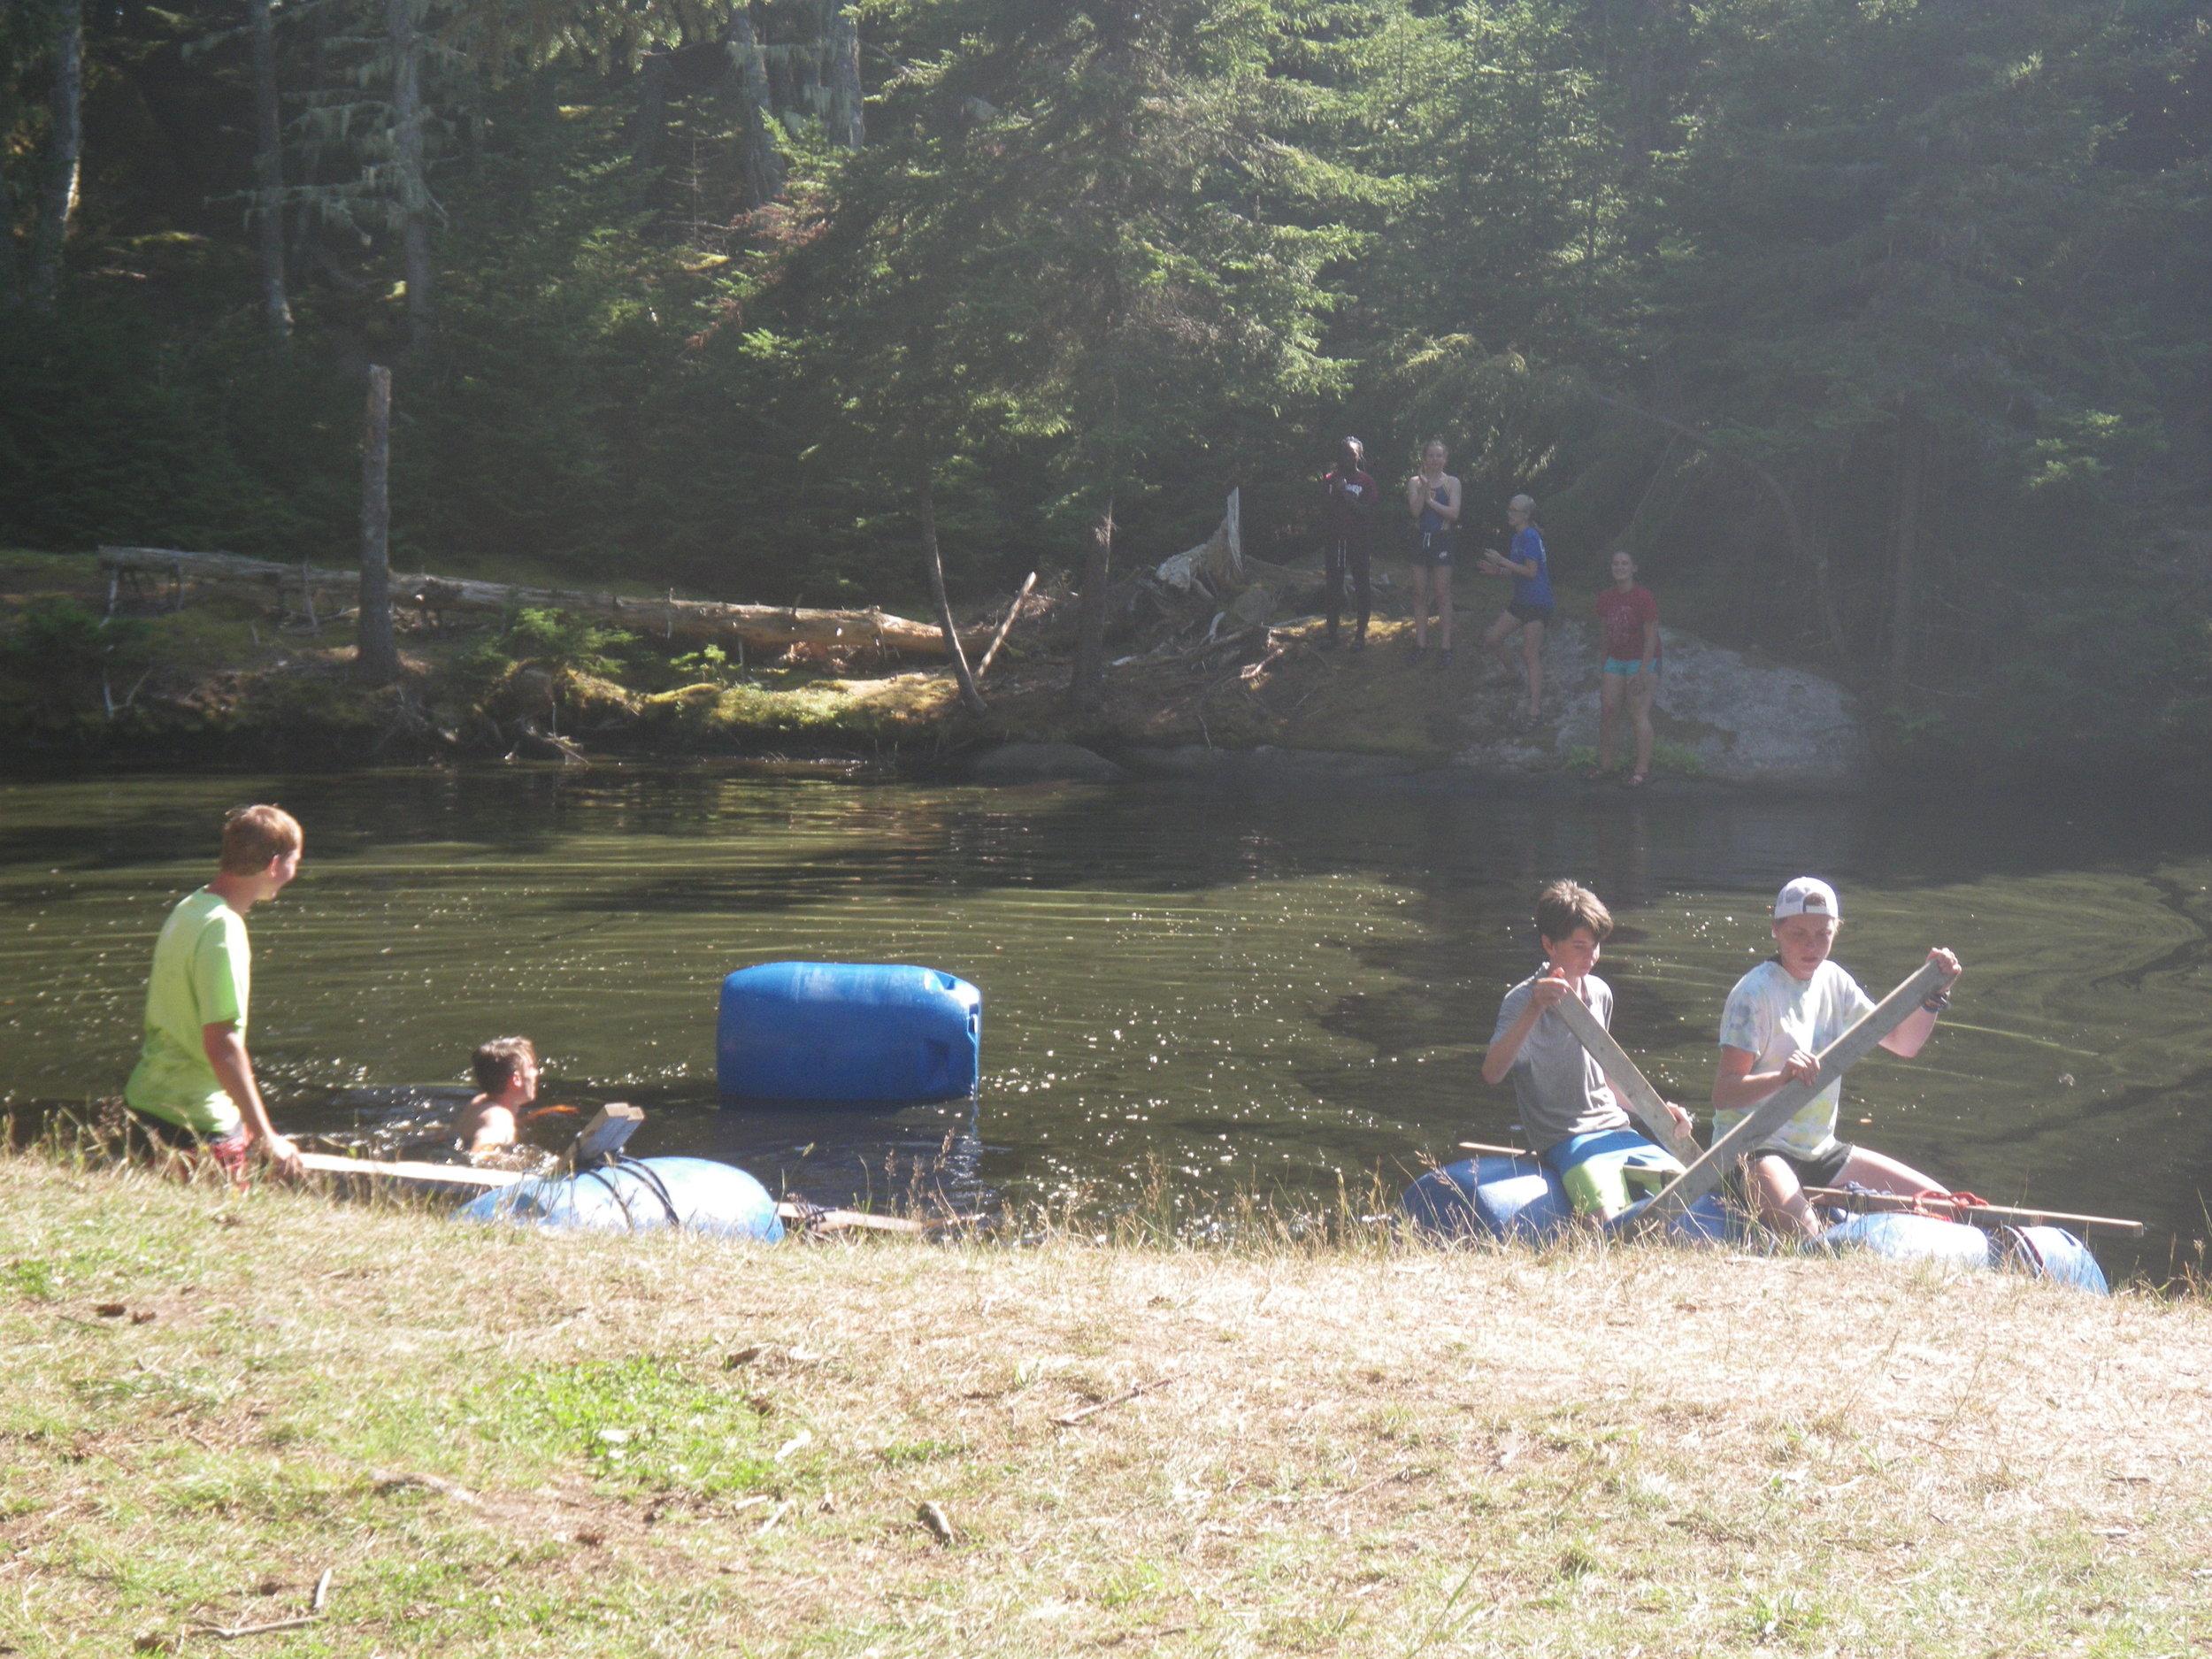 The raft challenge juxtaposition.